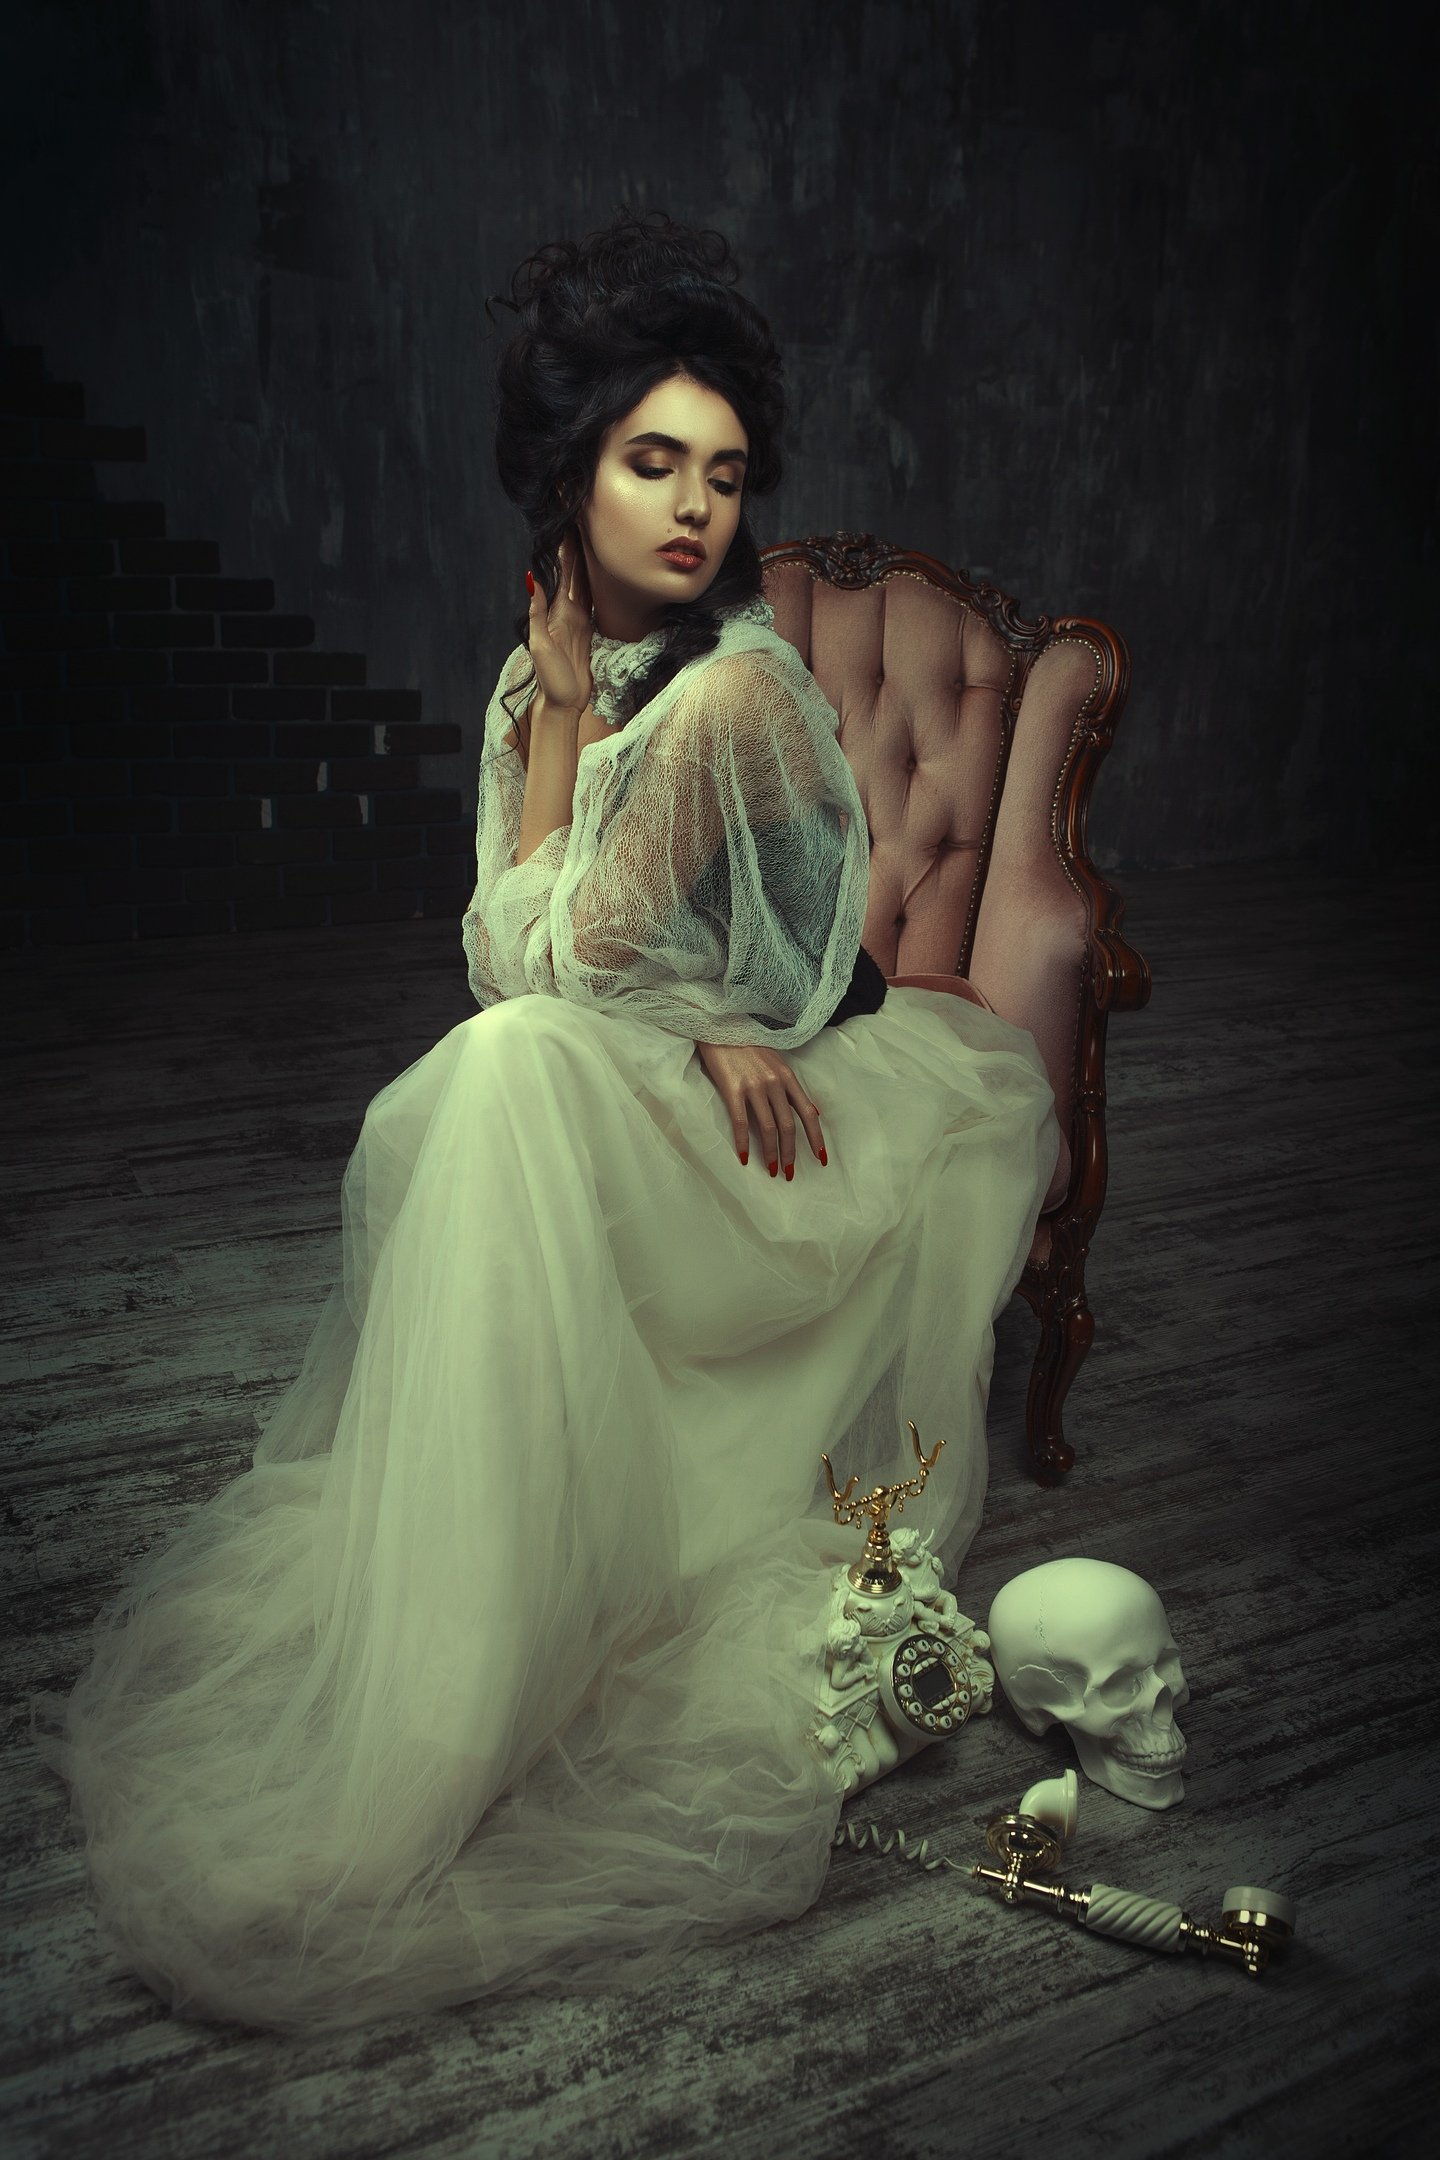 hamlet, skull, lady, fashion, dark, goth, retro, portrait, renaissance, woman, phone,, Клио Катерина